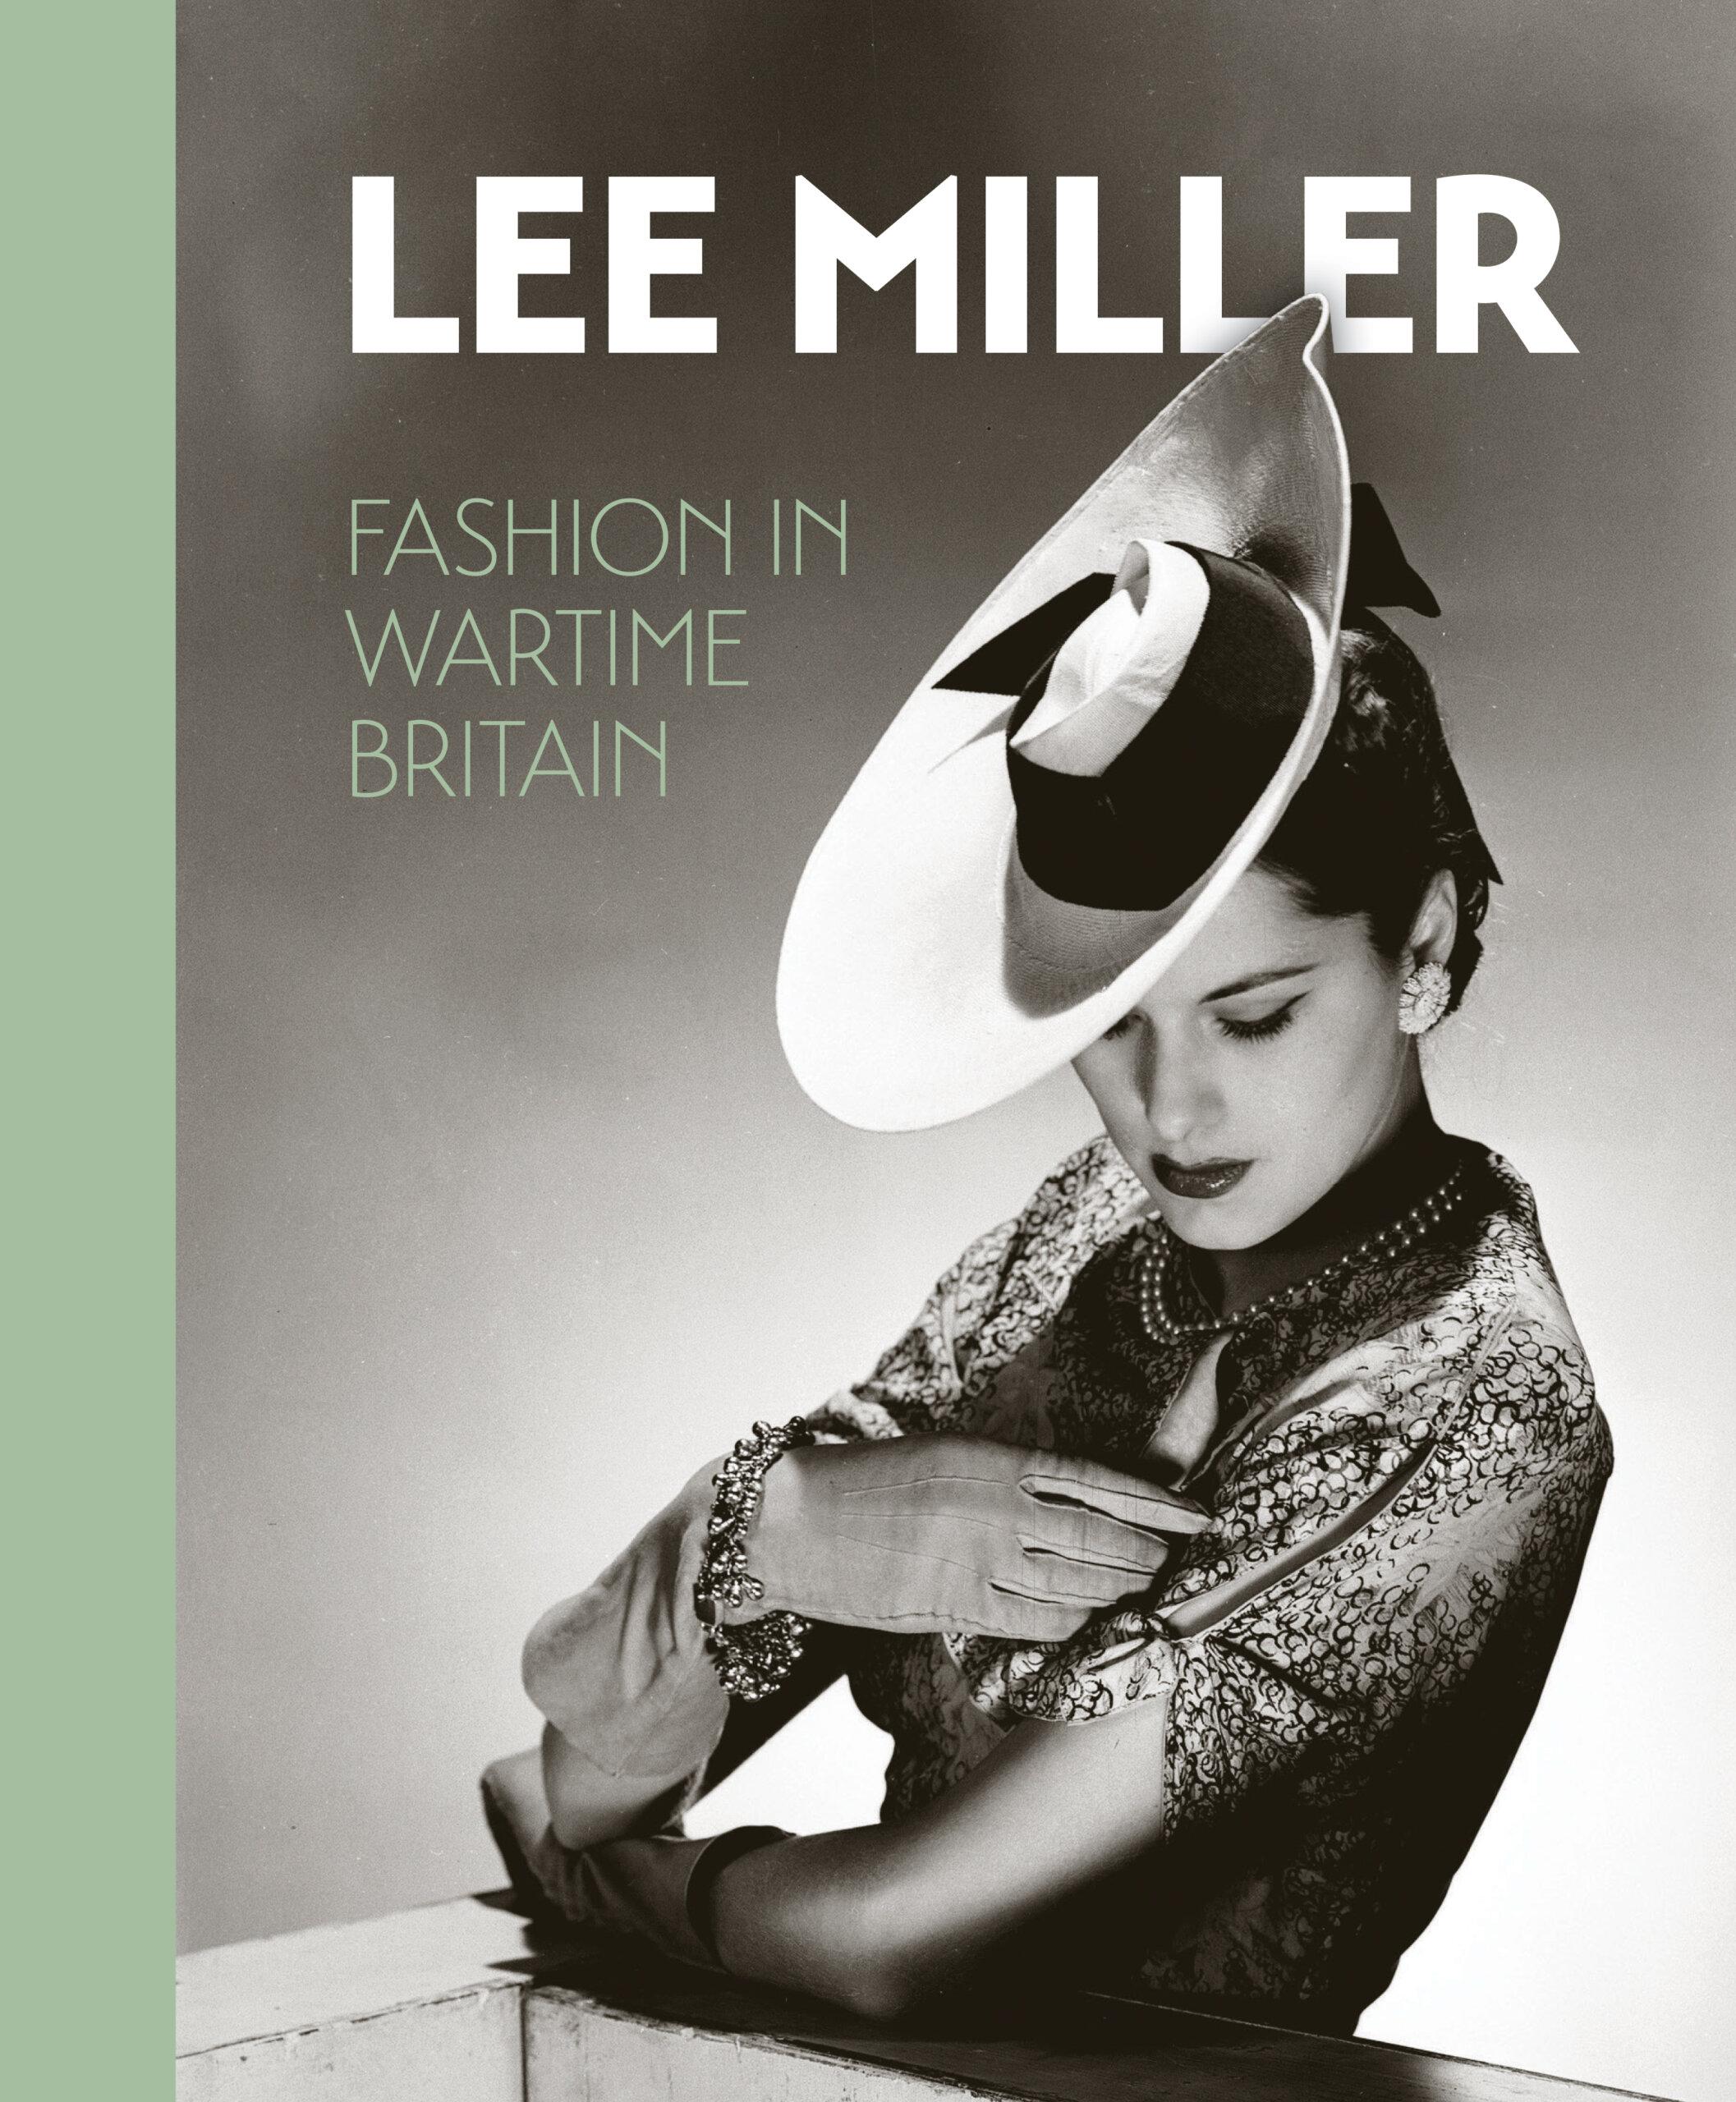 Lee Miller: Fashion in Wartime Britain